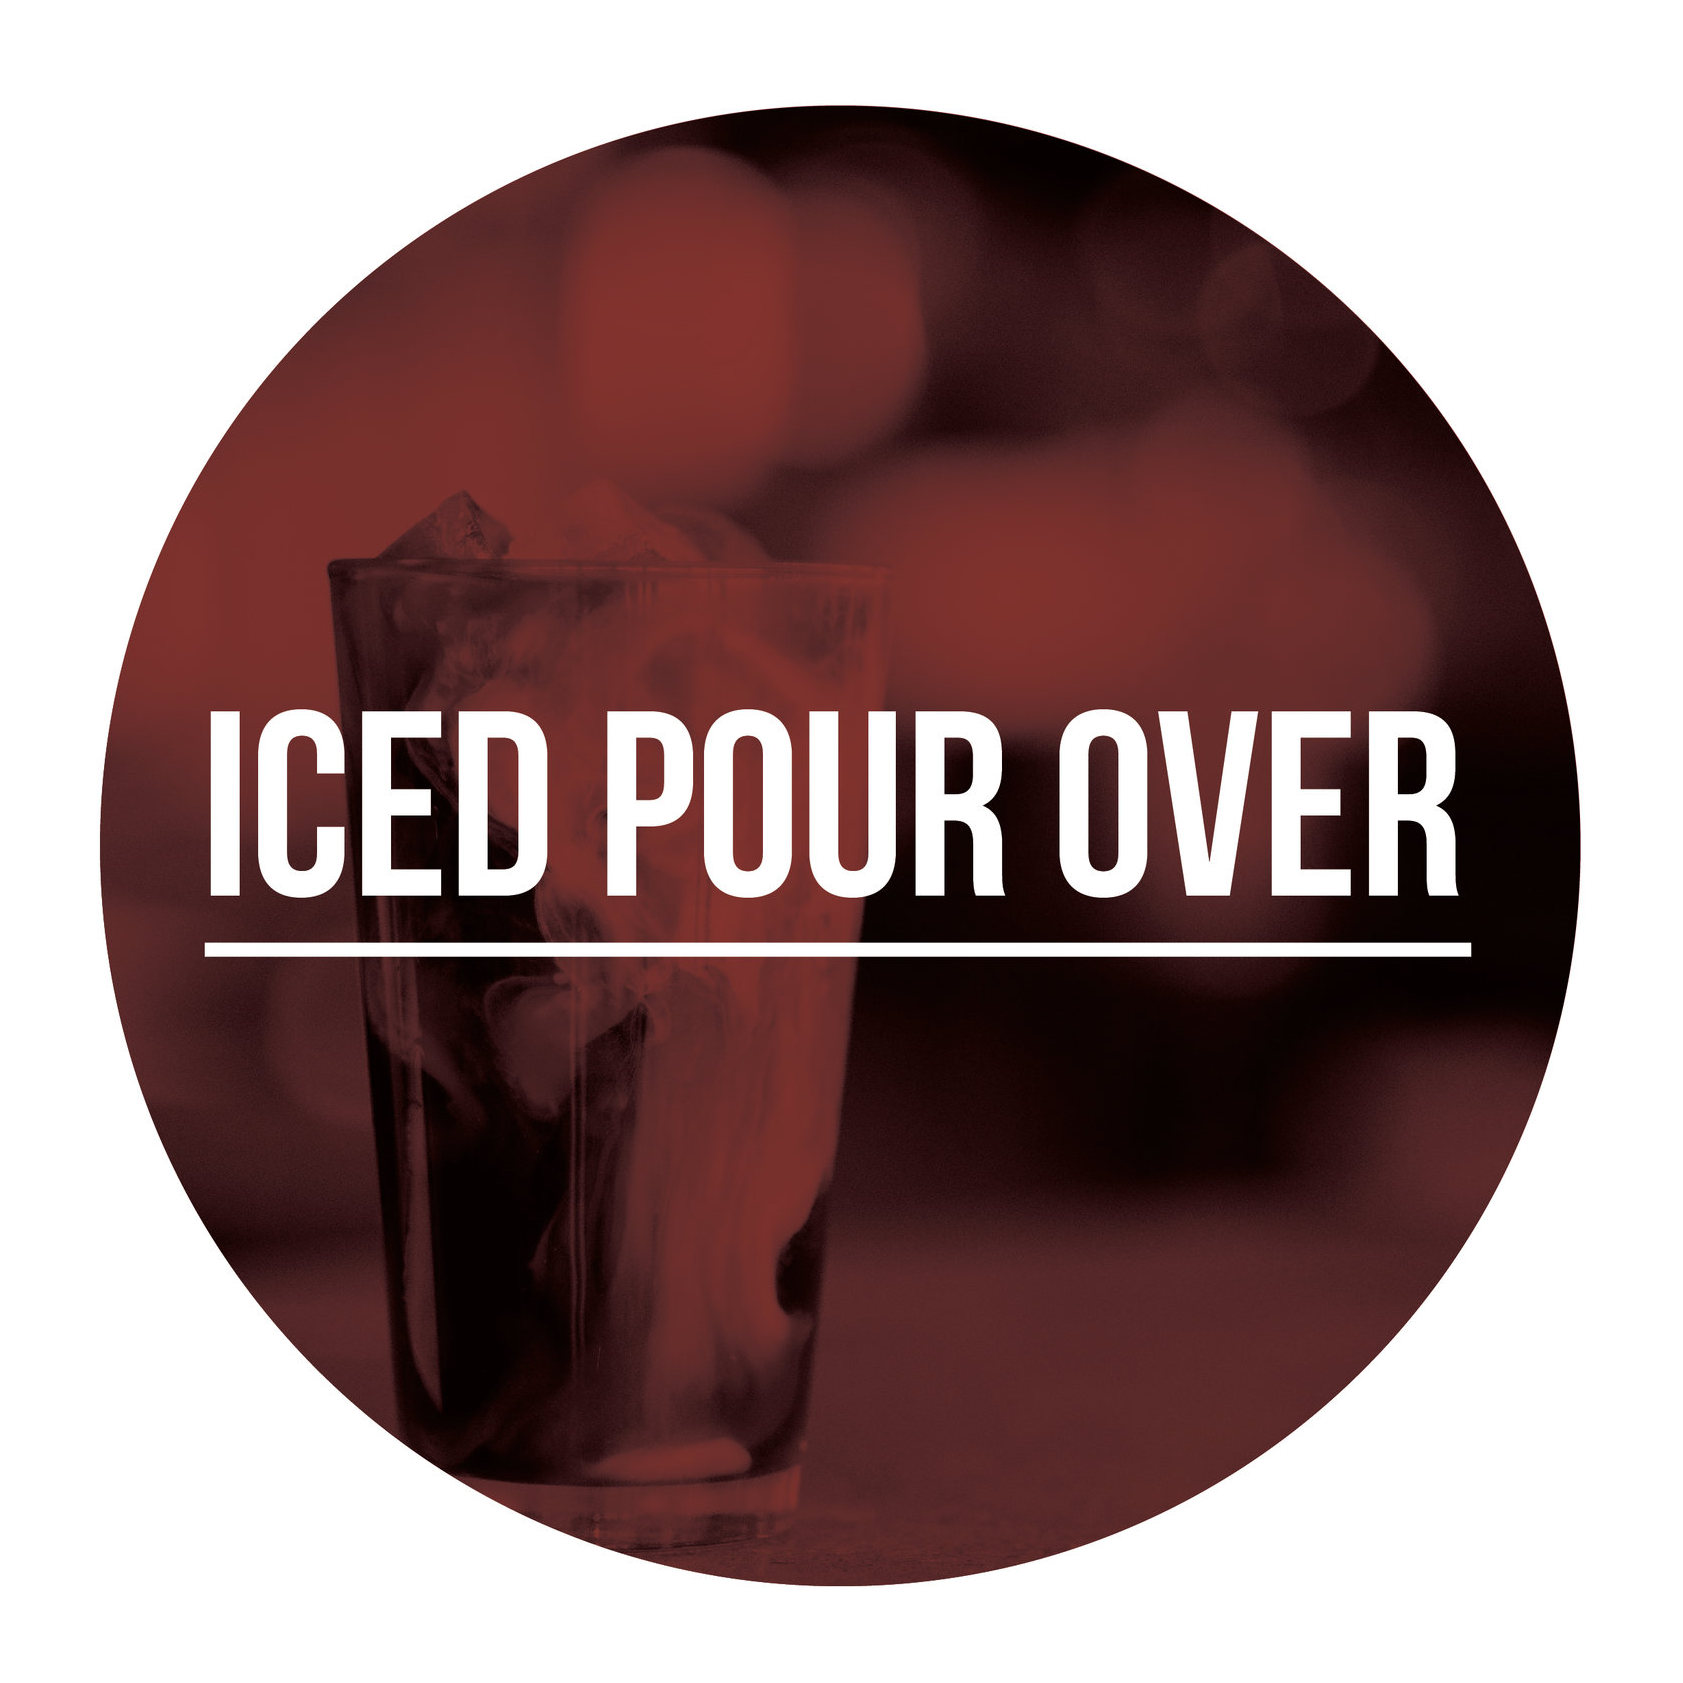 icedpourover.jpg